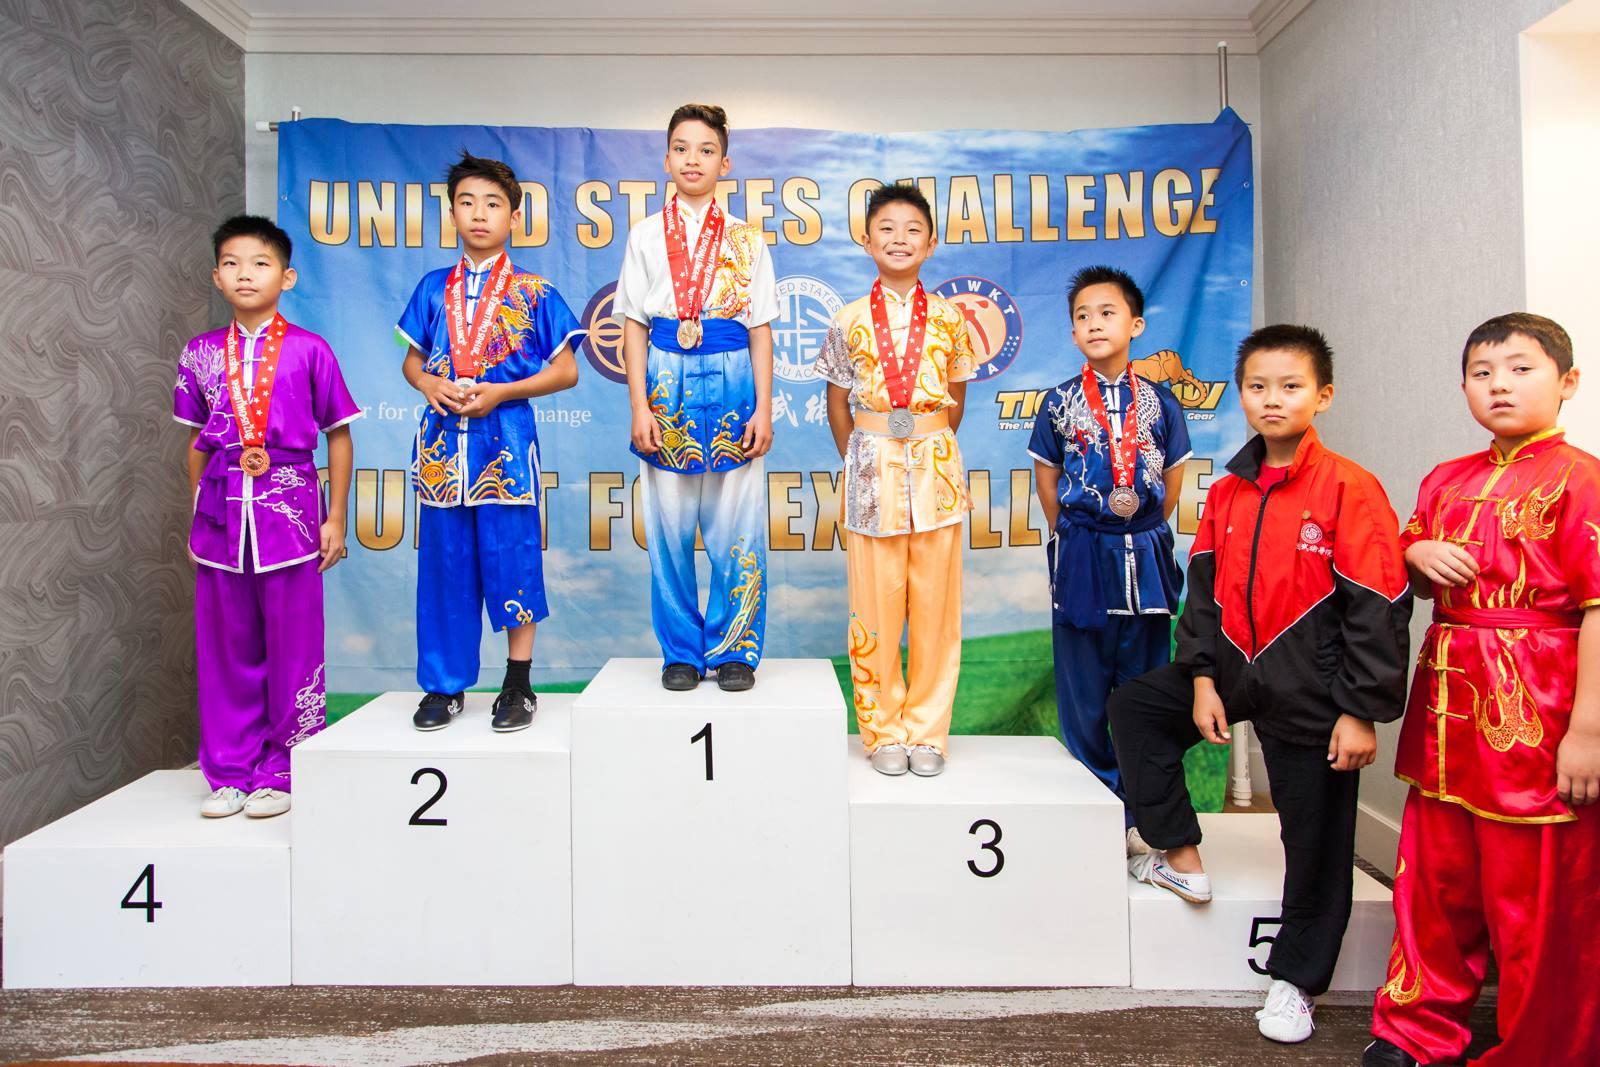 wayland-li-wushu-us-challenge-competition-maryland-2017-40.jpg